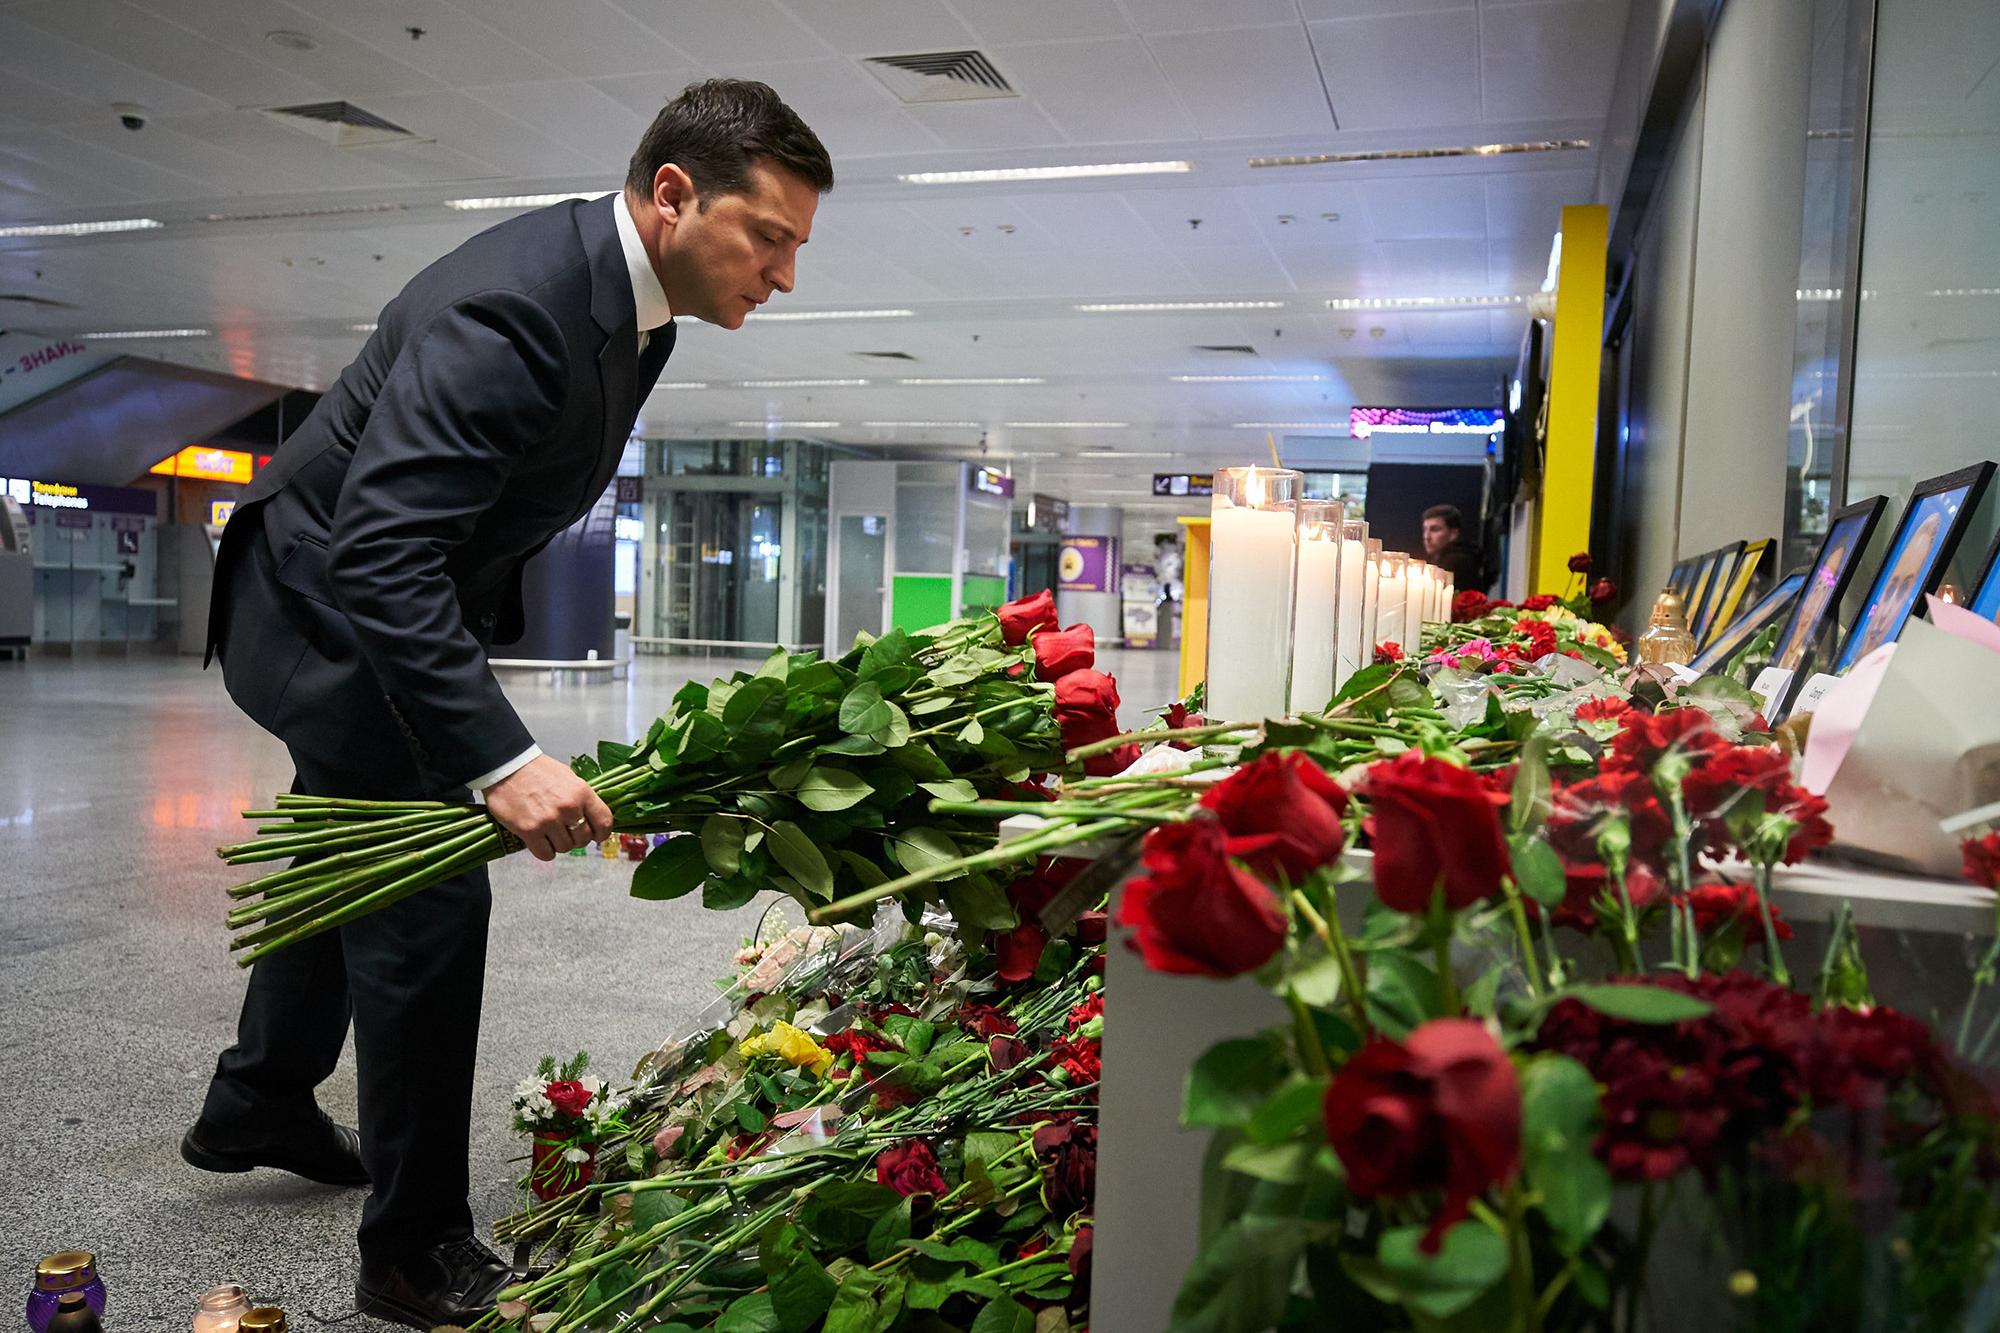 Ukrainian President Volodymyr Zelensky places flowers near the photographs of the dead at Ukraine's Boryspil airport.